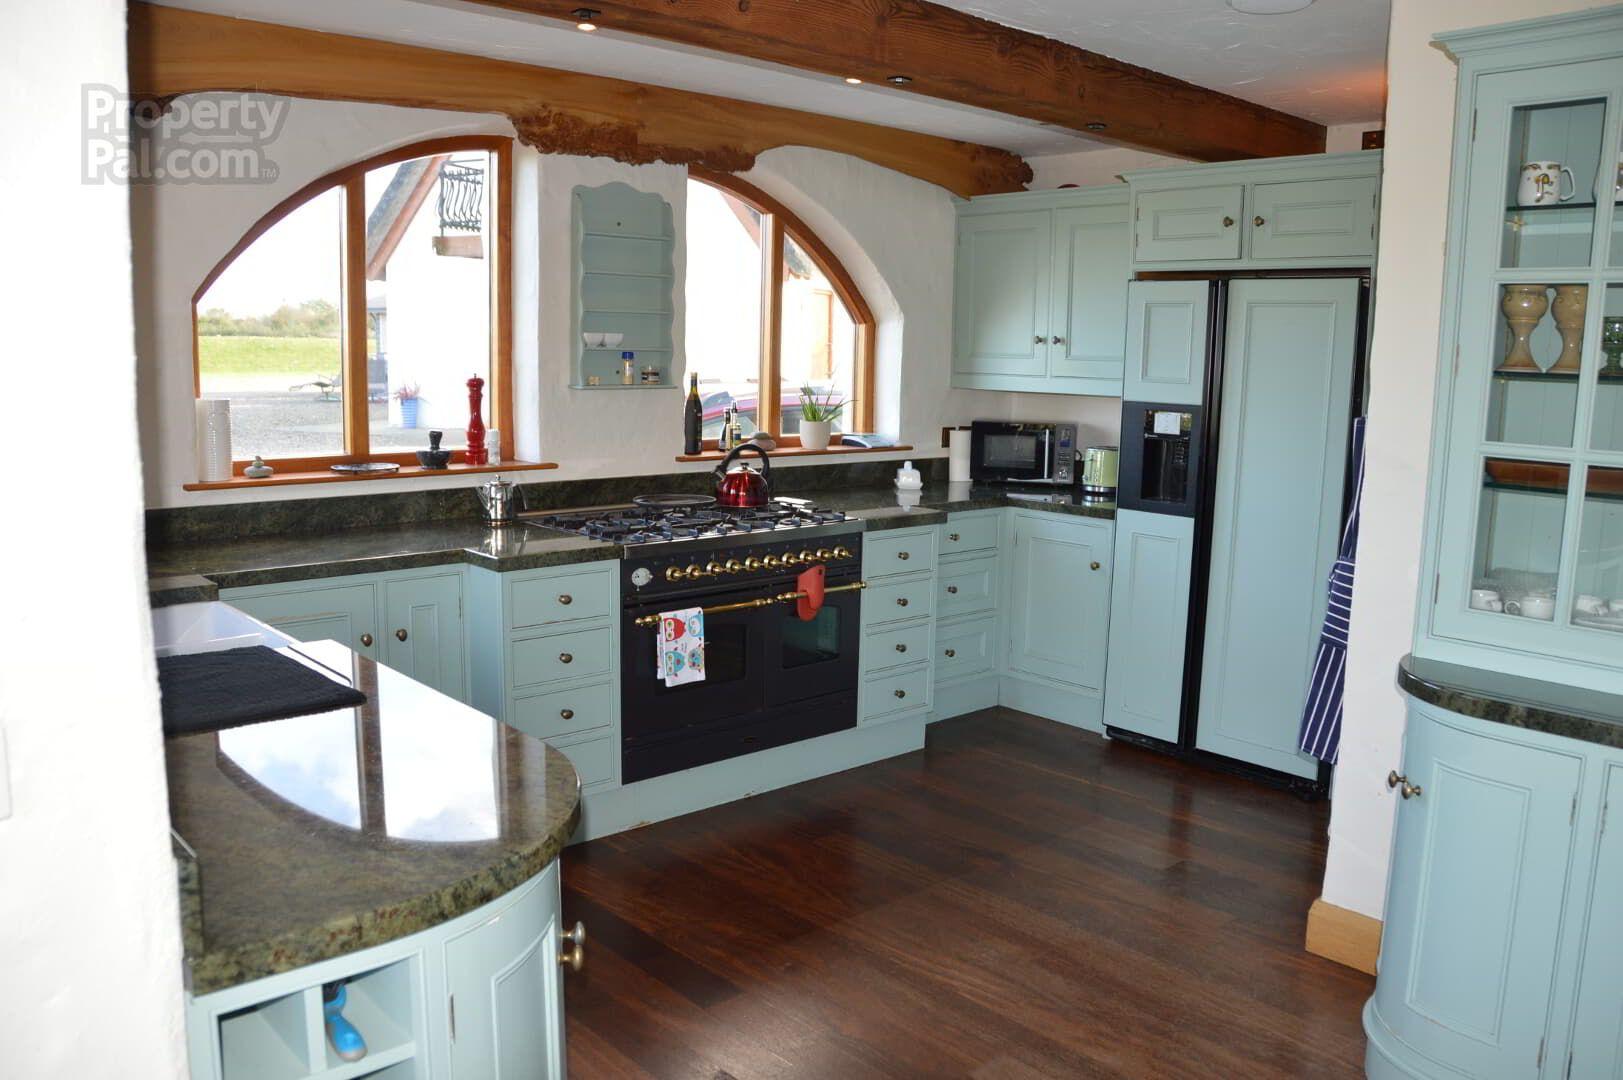 111 & 111A Gracehill Road, Stranocum, Ballymoney #kitchen #turquoise ...